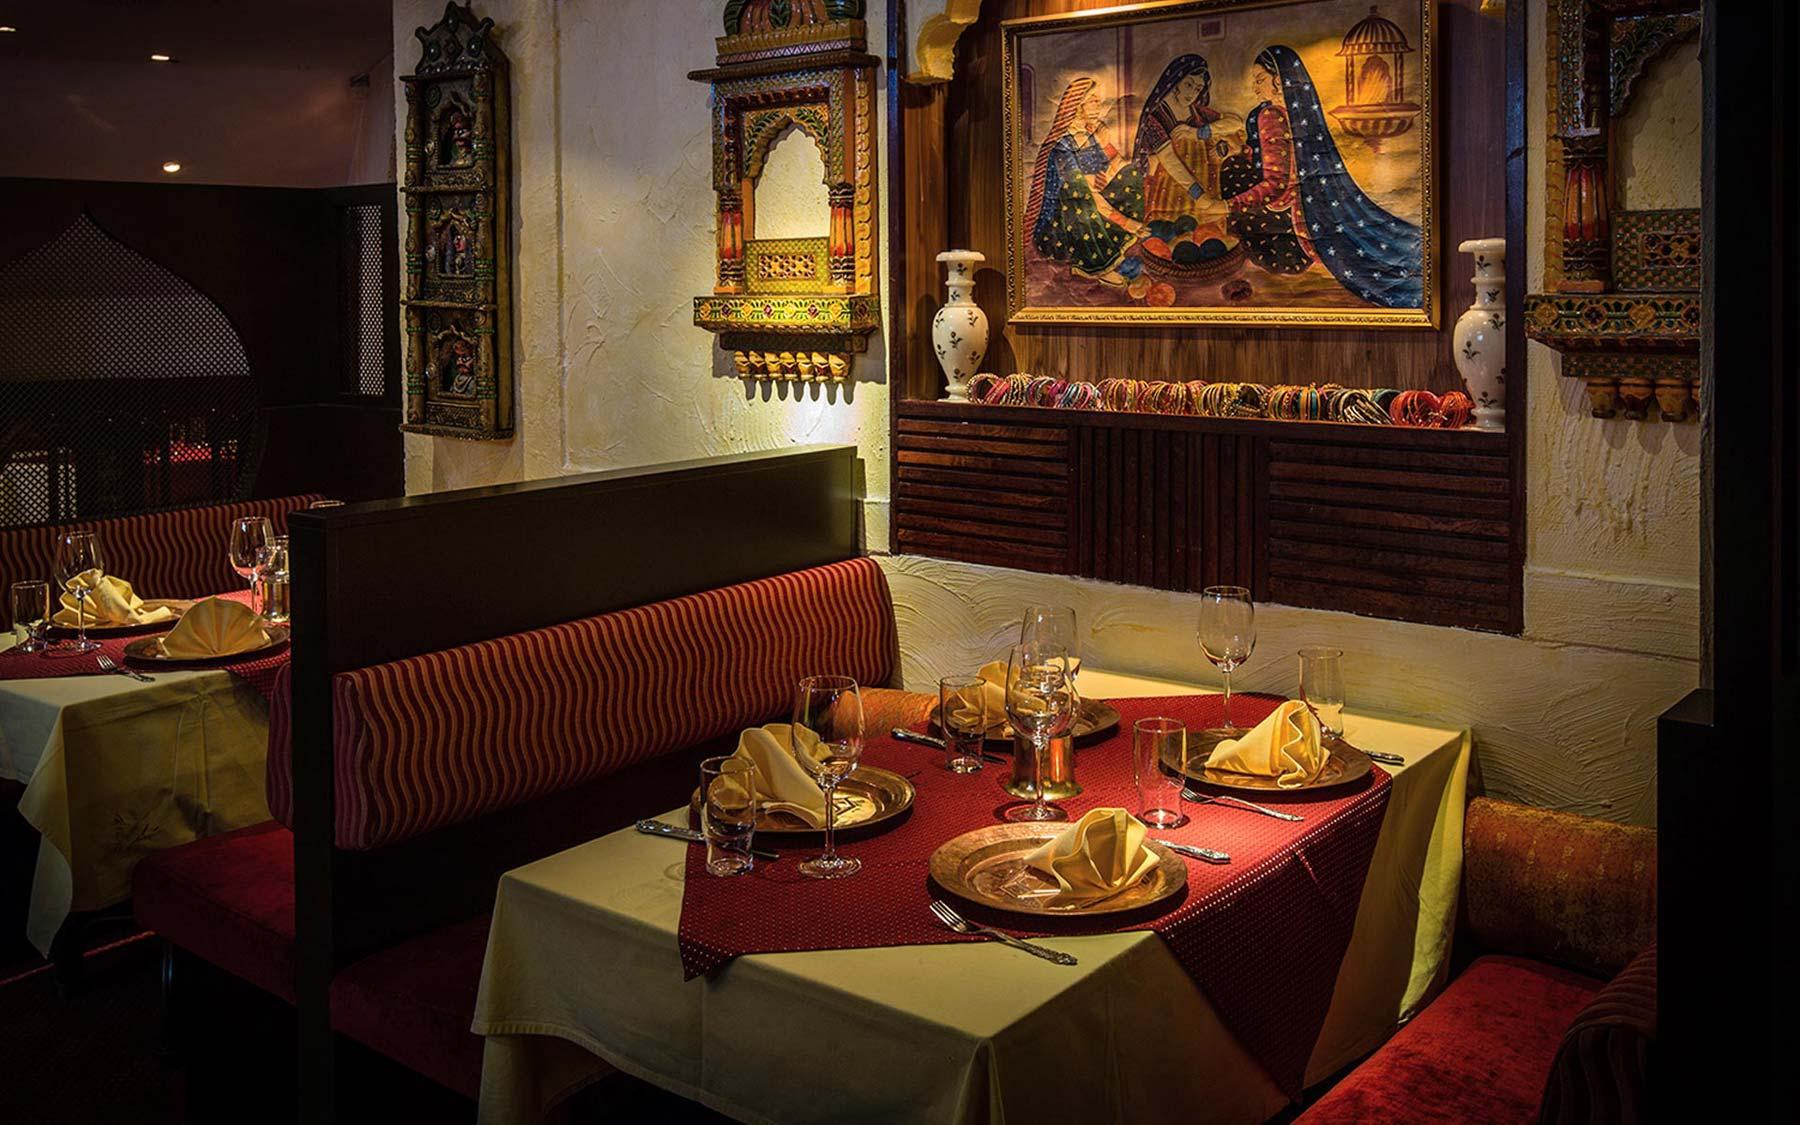 Free online dating sites romantiske restauranter oslo